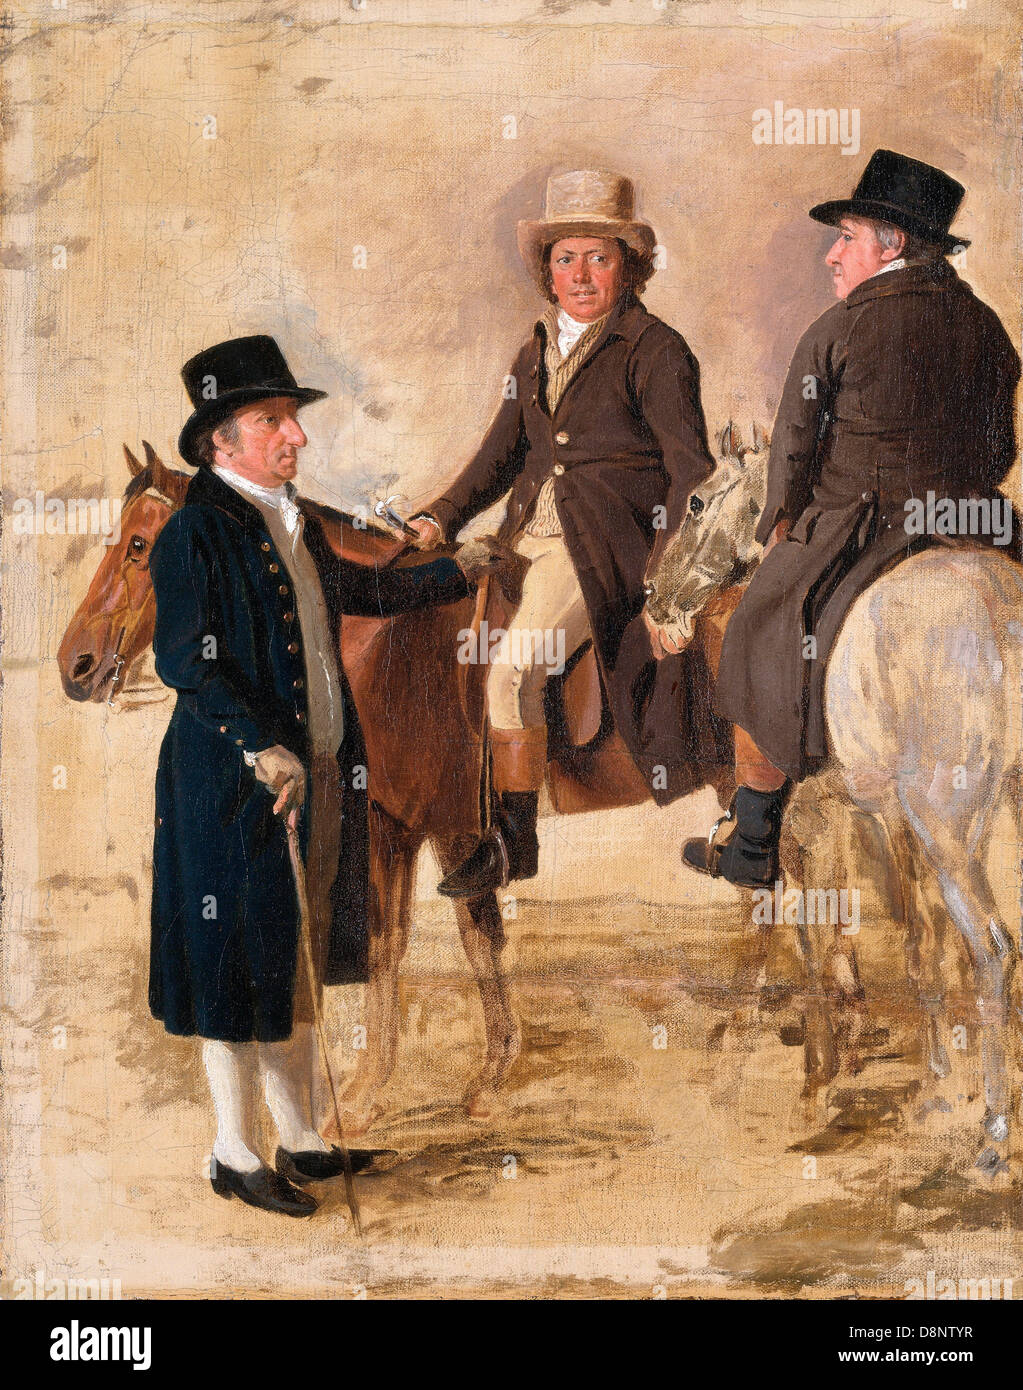 Benjamin Marshall, John Hilton, Judge of the Course at Newmarket; John Fuller, Clerk of the Course; and John Stevens, - Stock Image